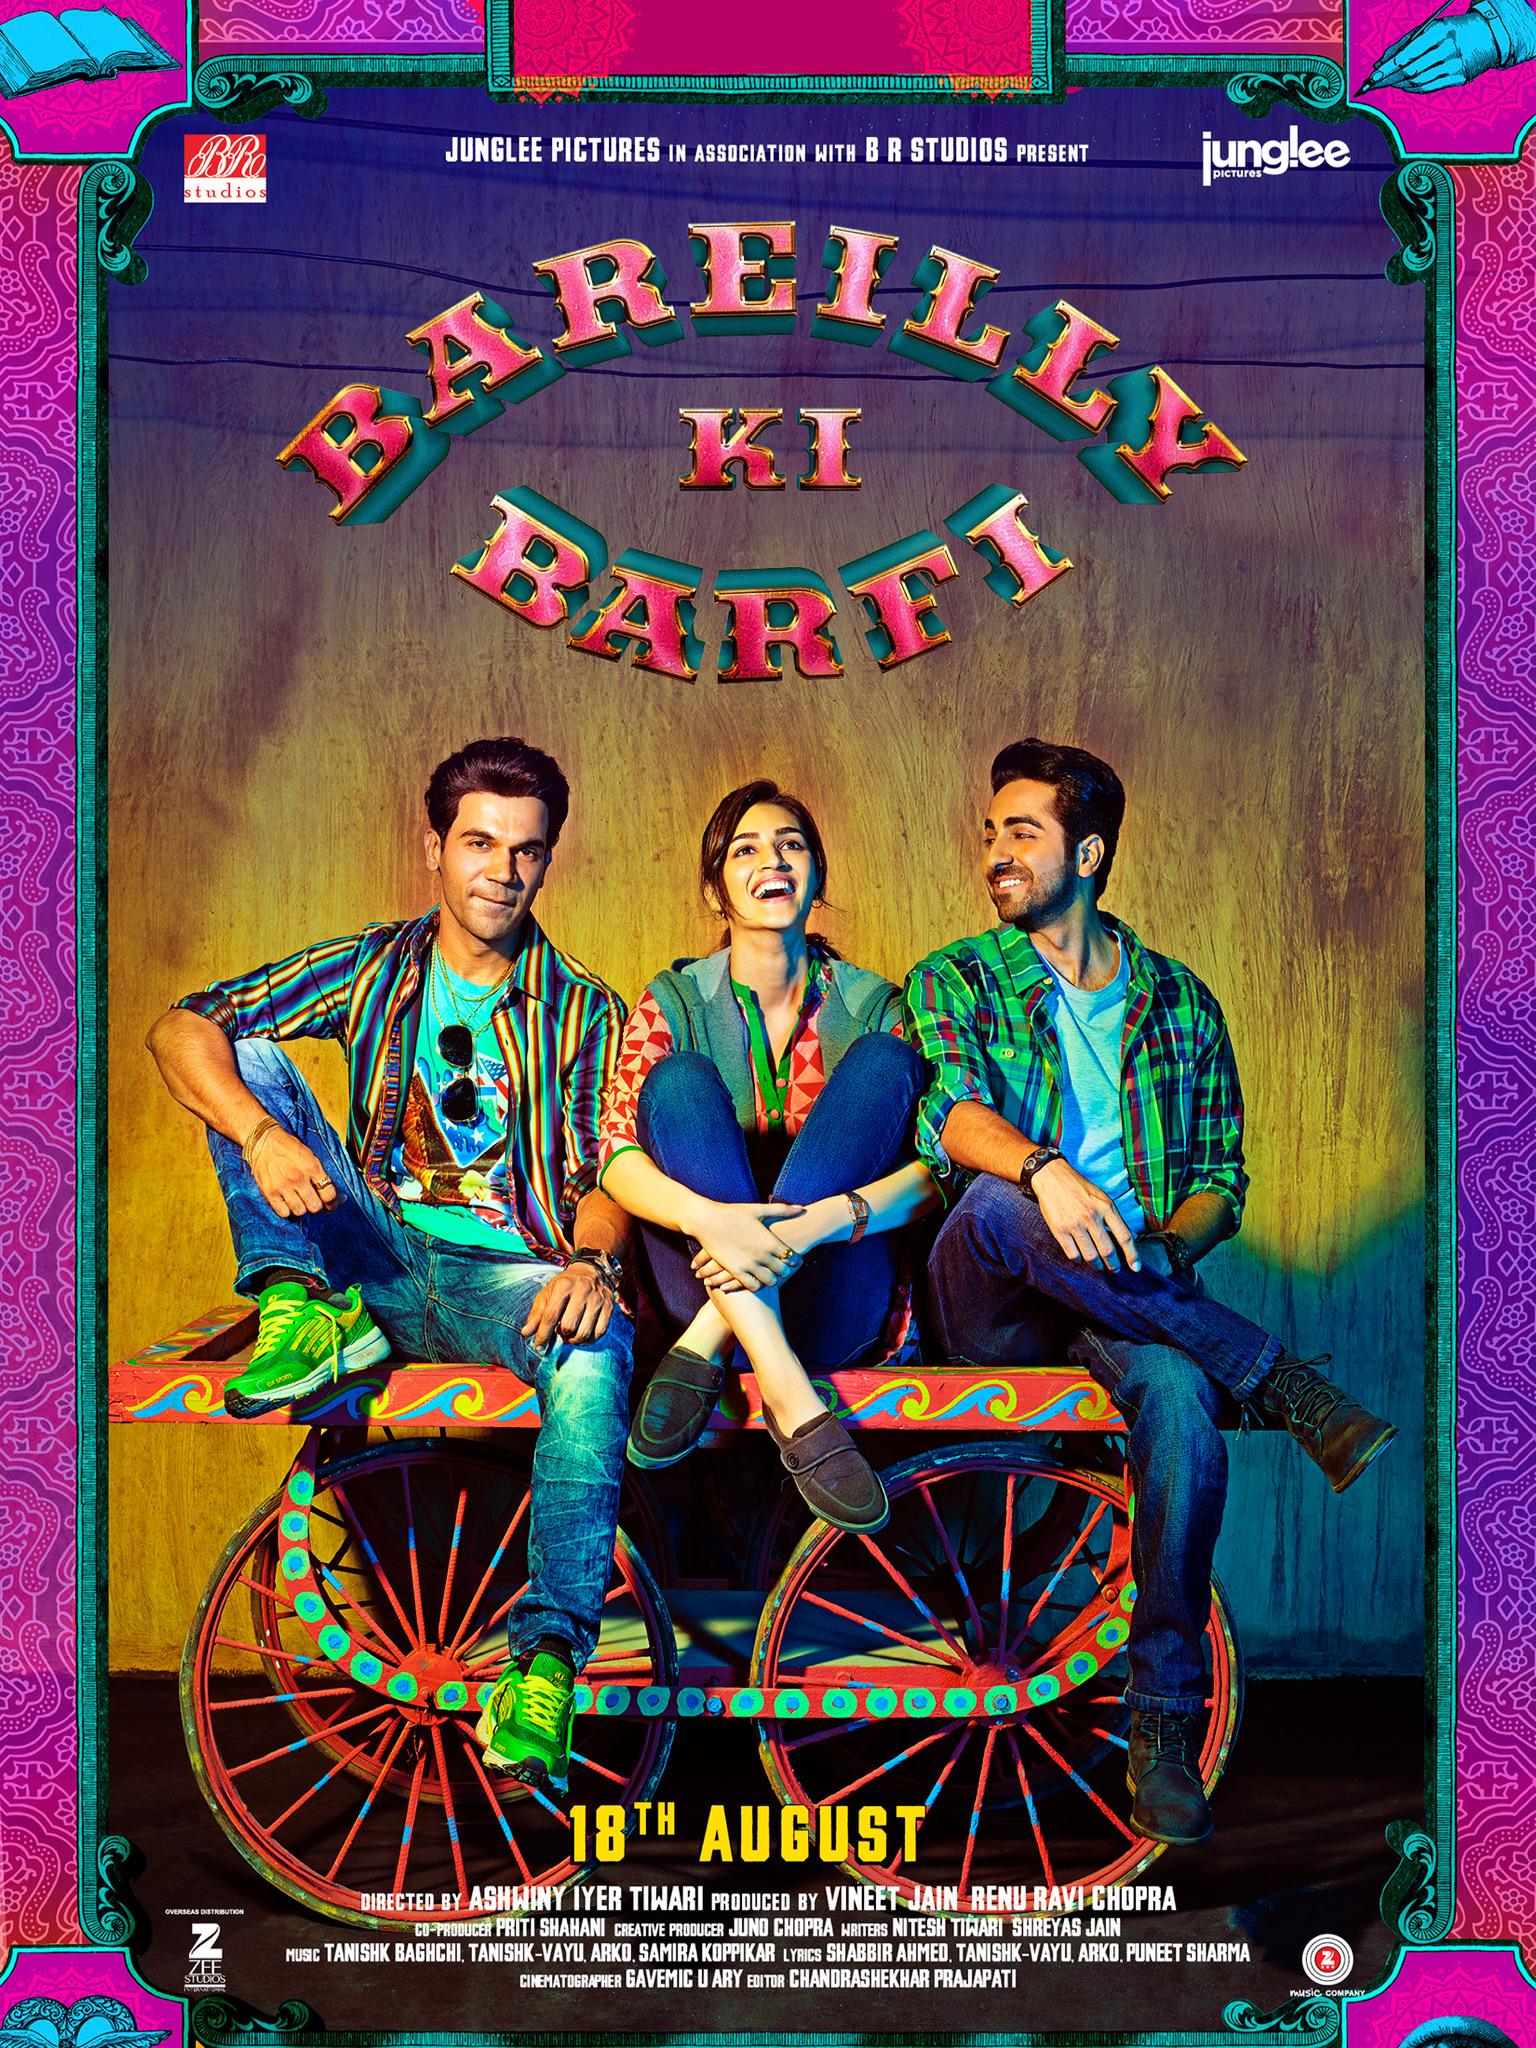 Rajkummar Rao speaks about 'Bareilly Ki Barfi' role, wants to explore world cinema